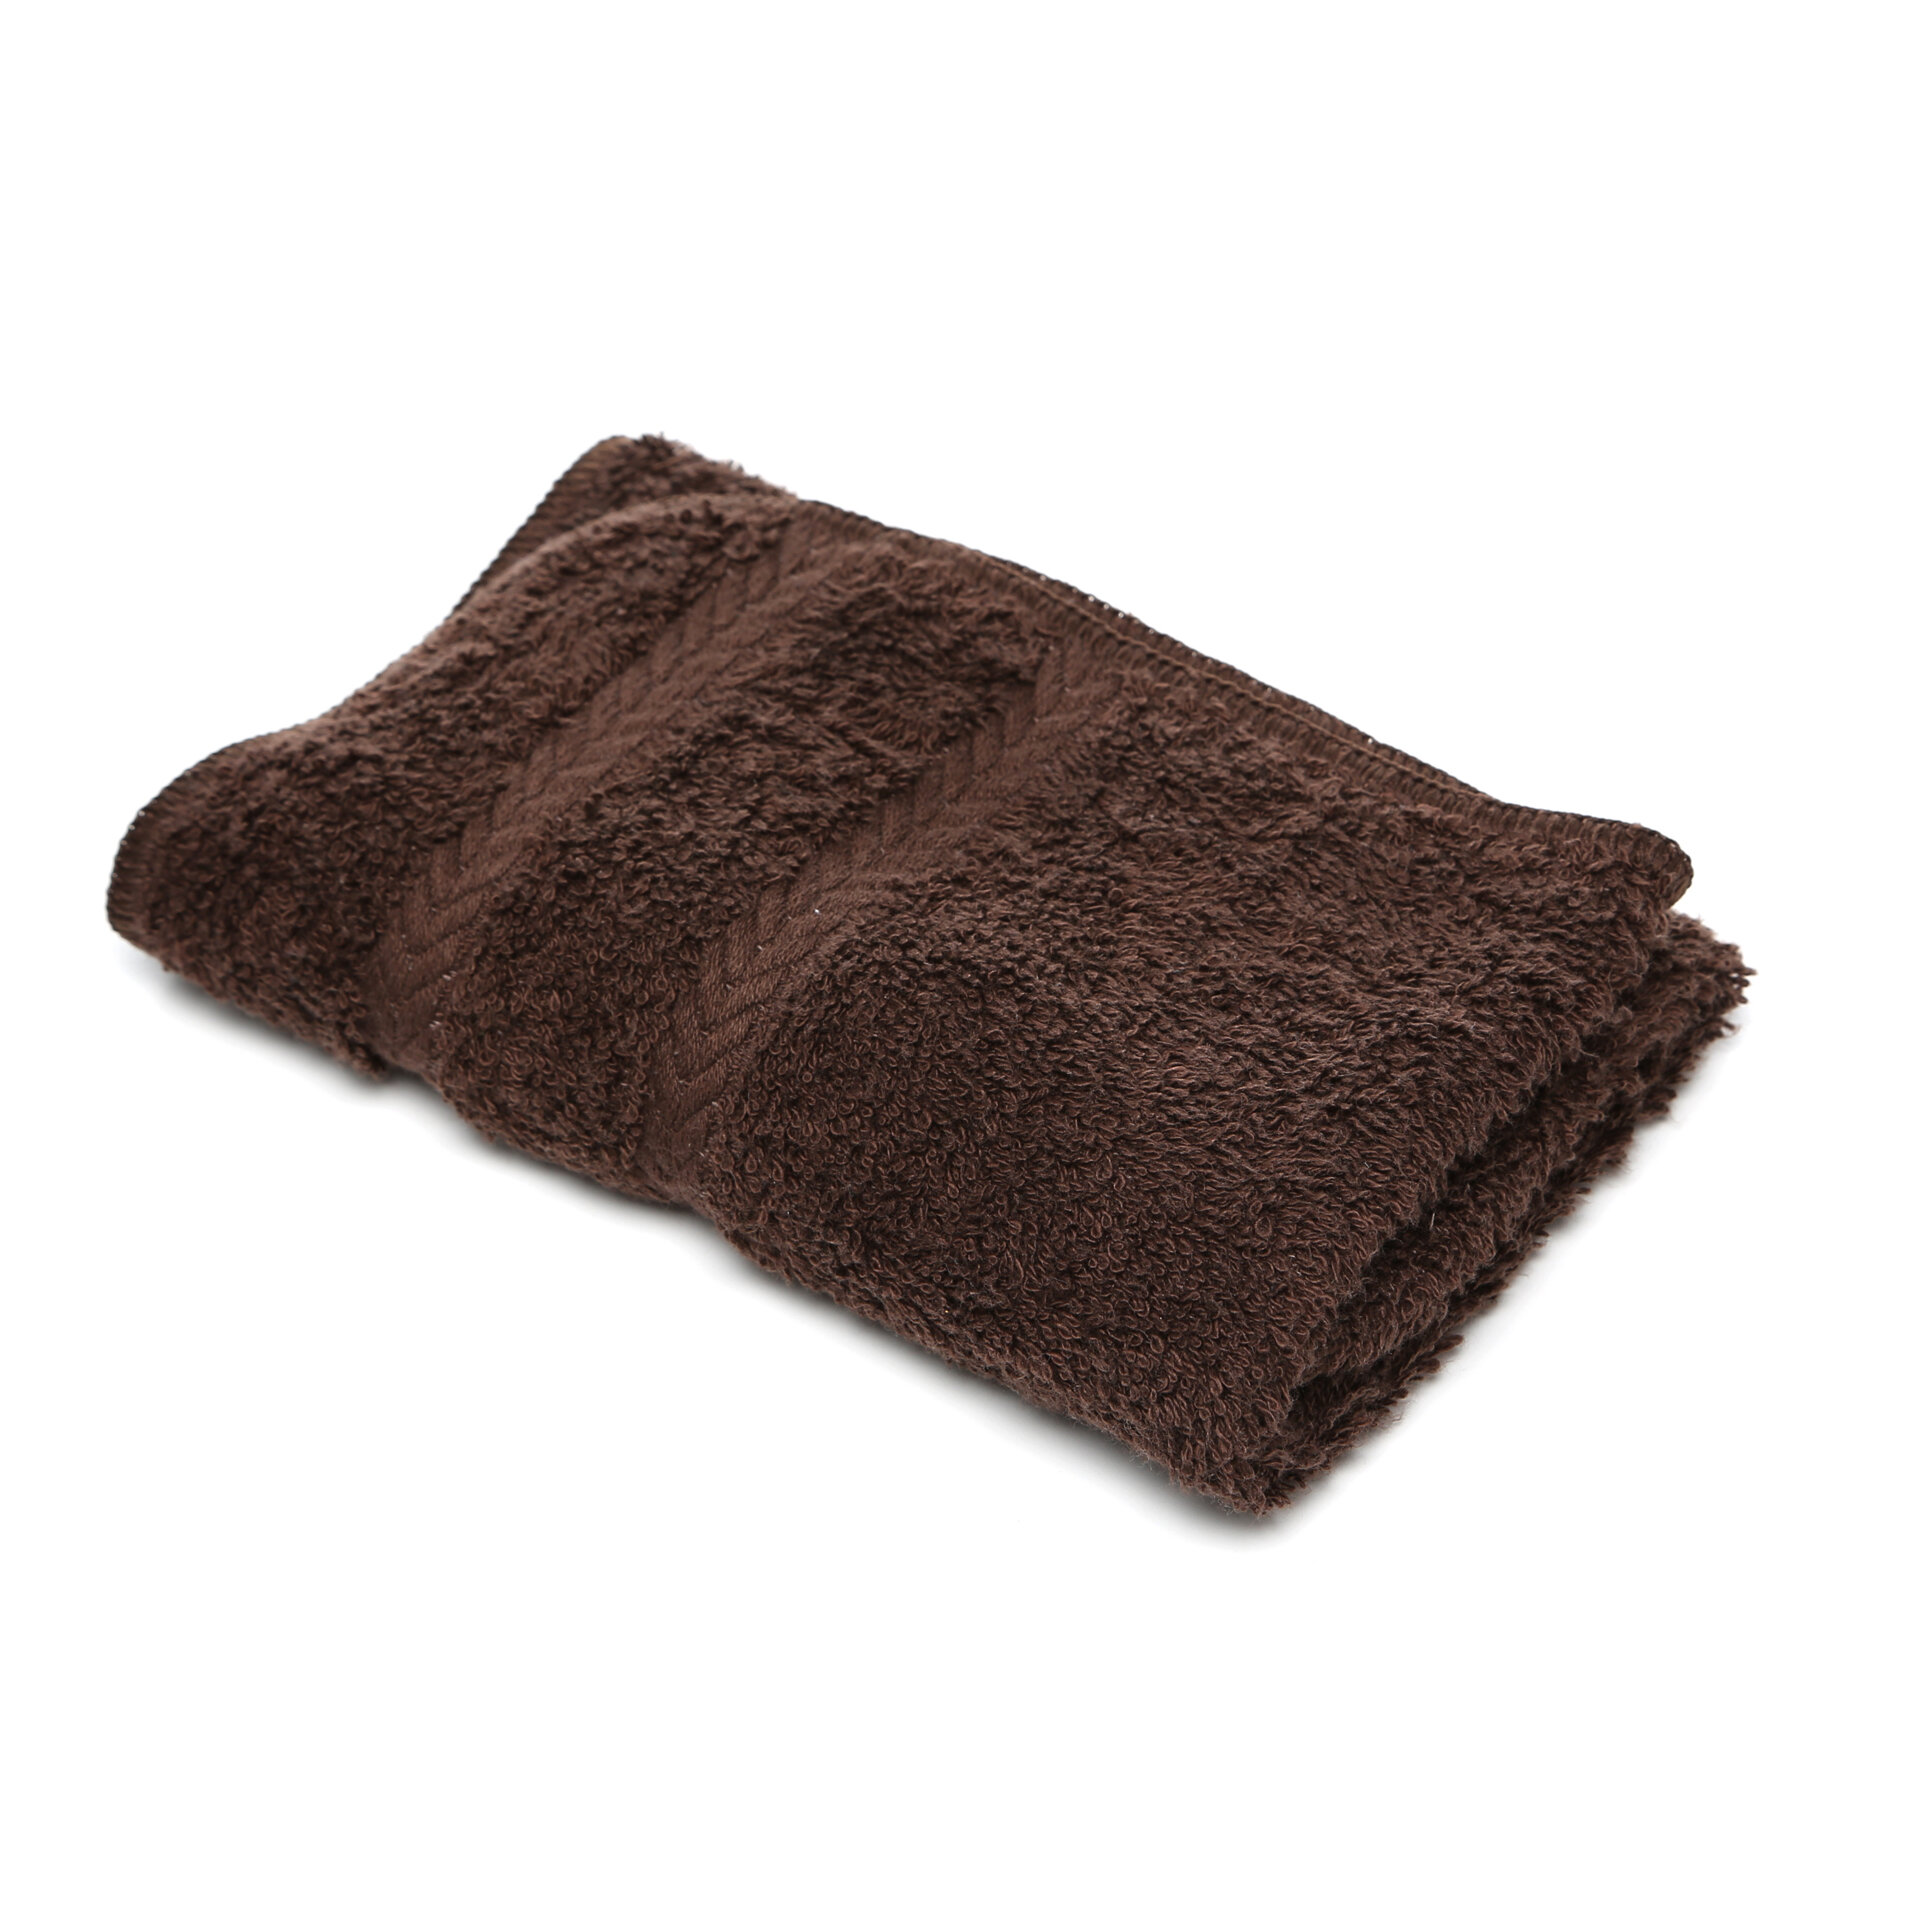 Martex Egyptian Egyptian Quality Cotton Hand Towel Reviews Wayfair